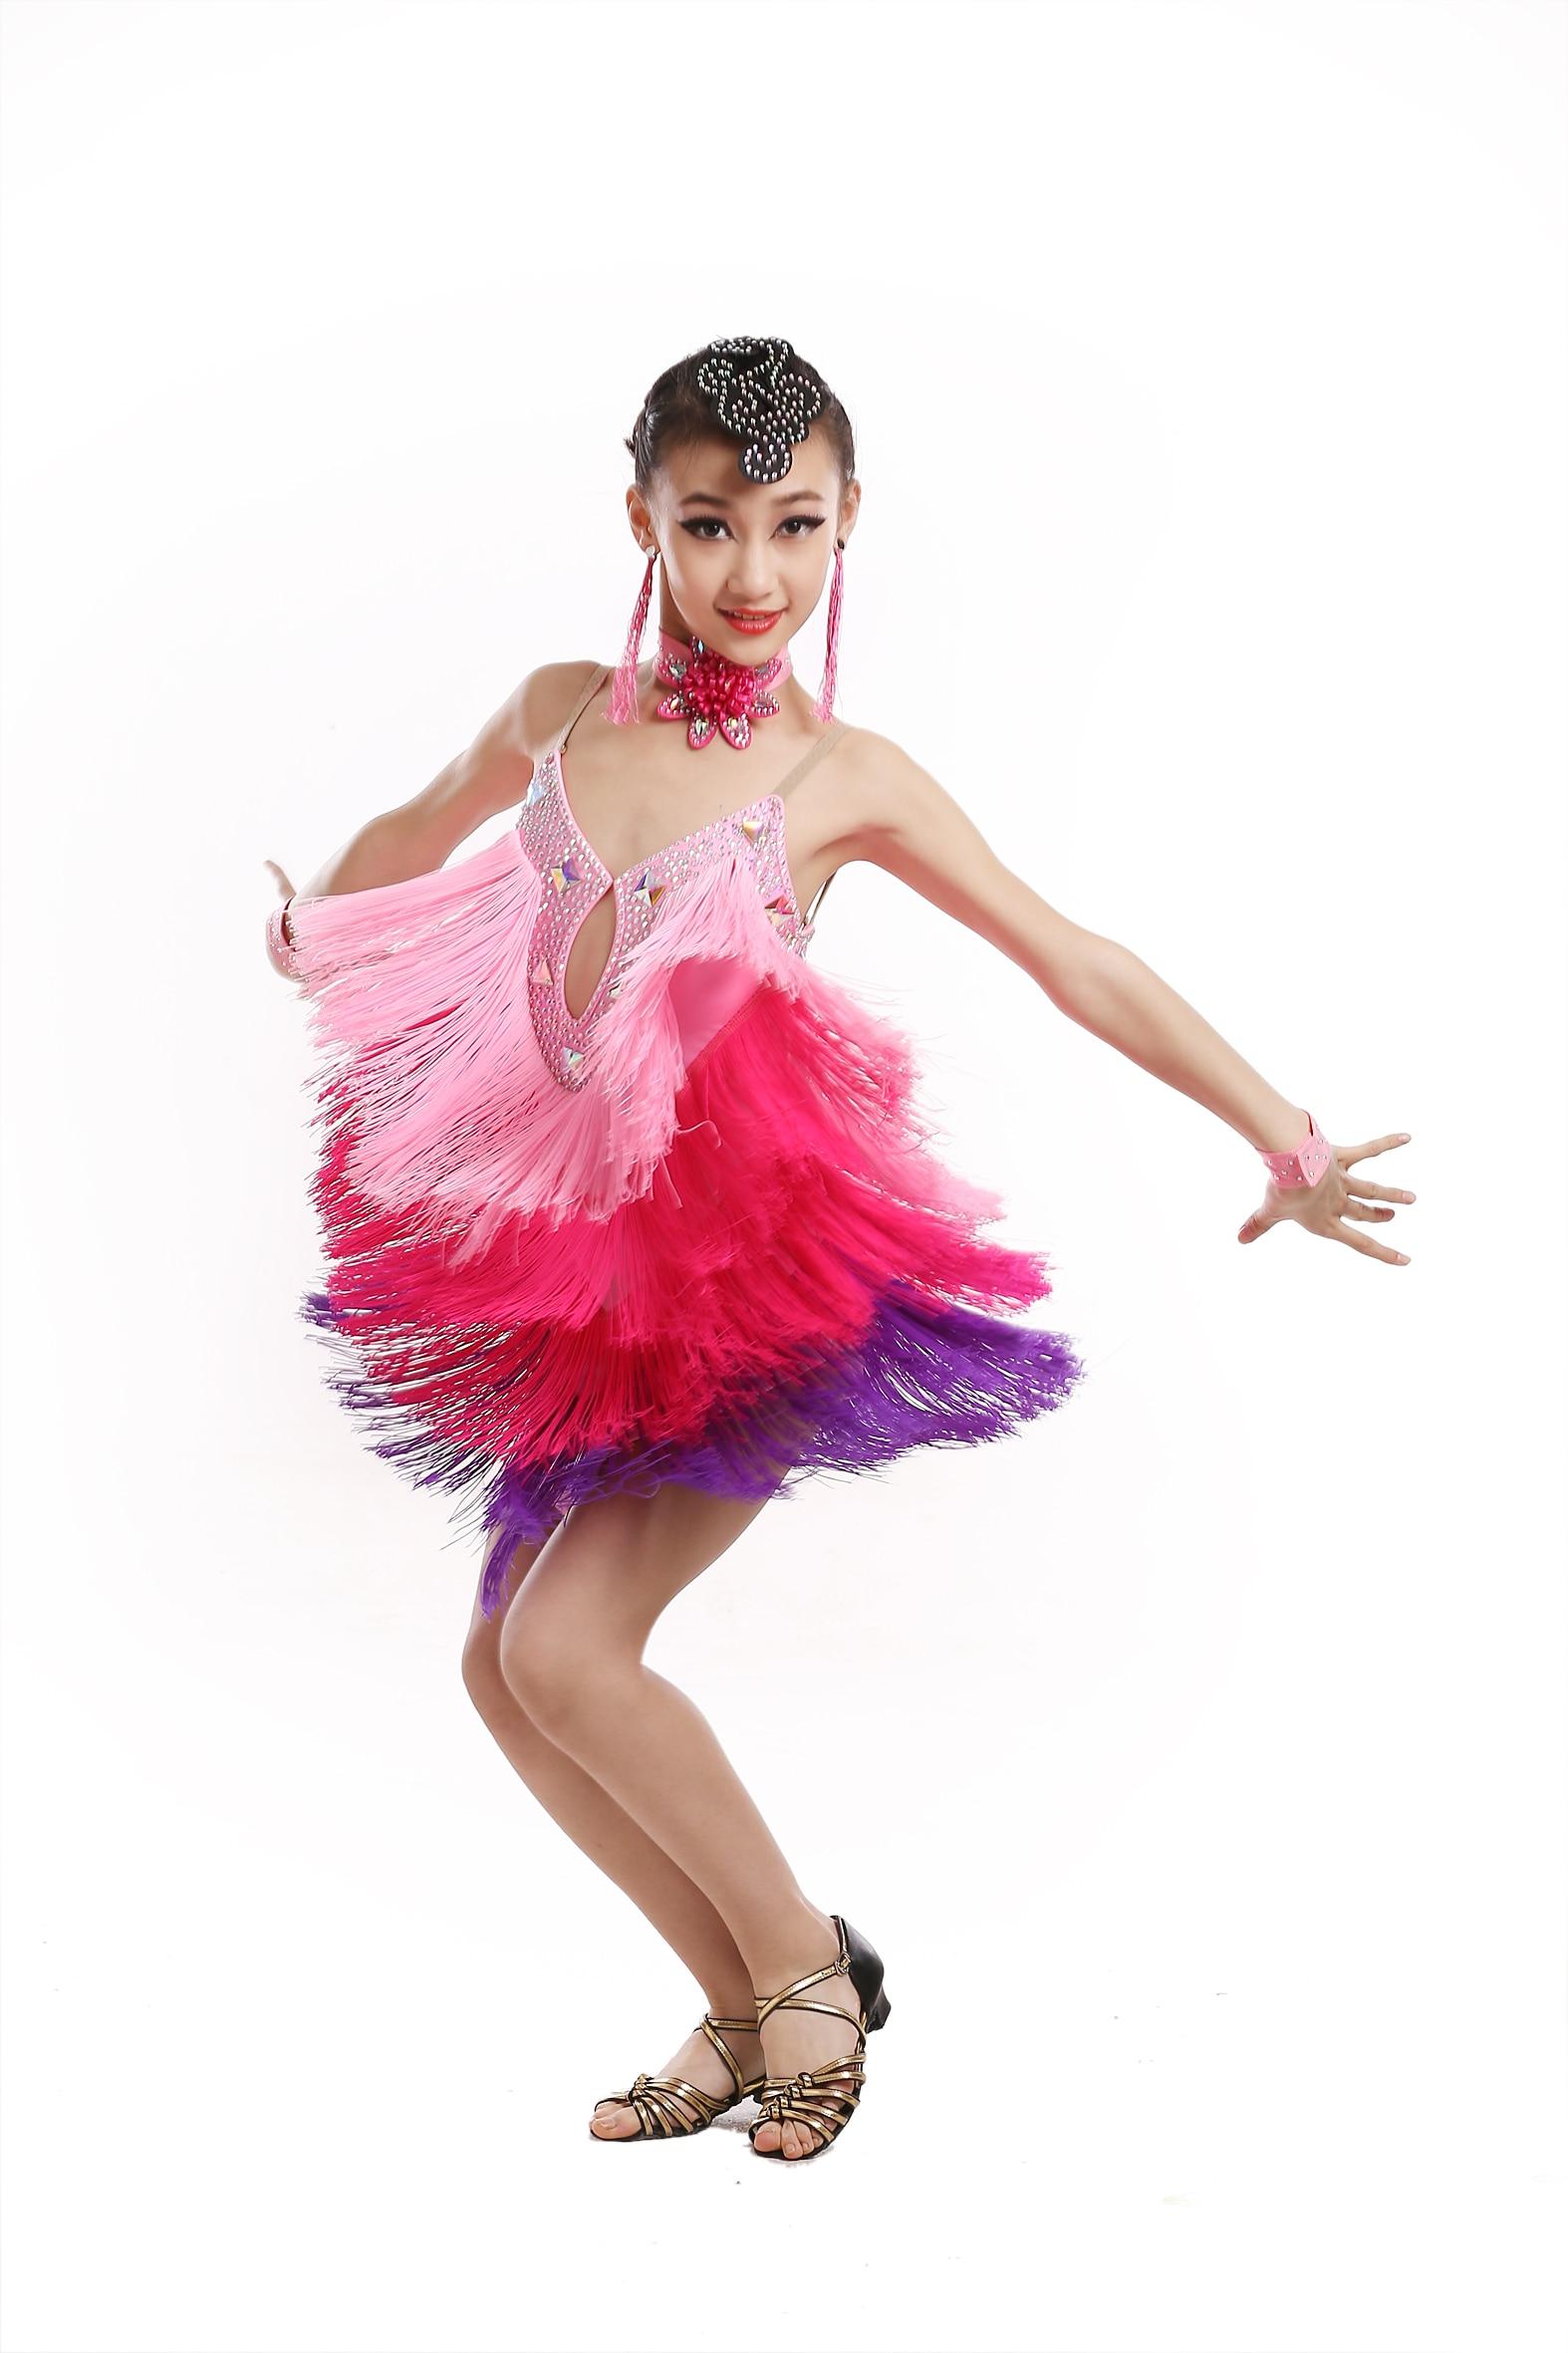 91da3349be2 Κορίτσια Μοντέρνο Φόρεμα Χορού Παιδικό Διαγωνισμό Χορού Λαϊκό Φόρεμα ...